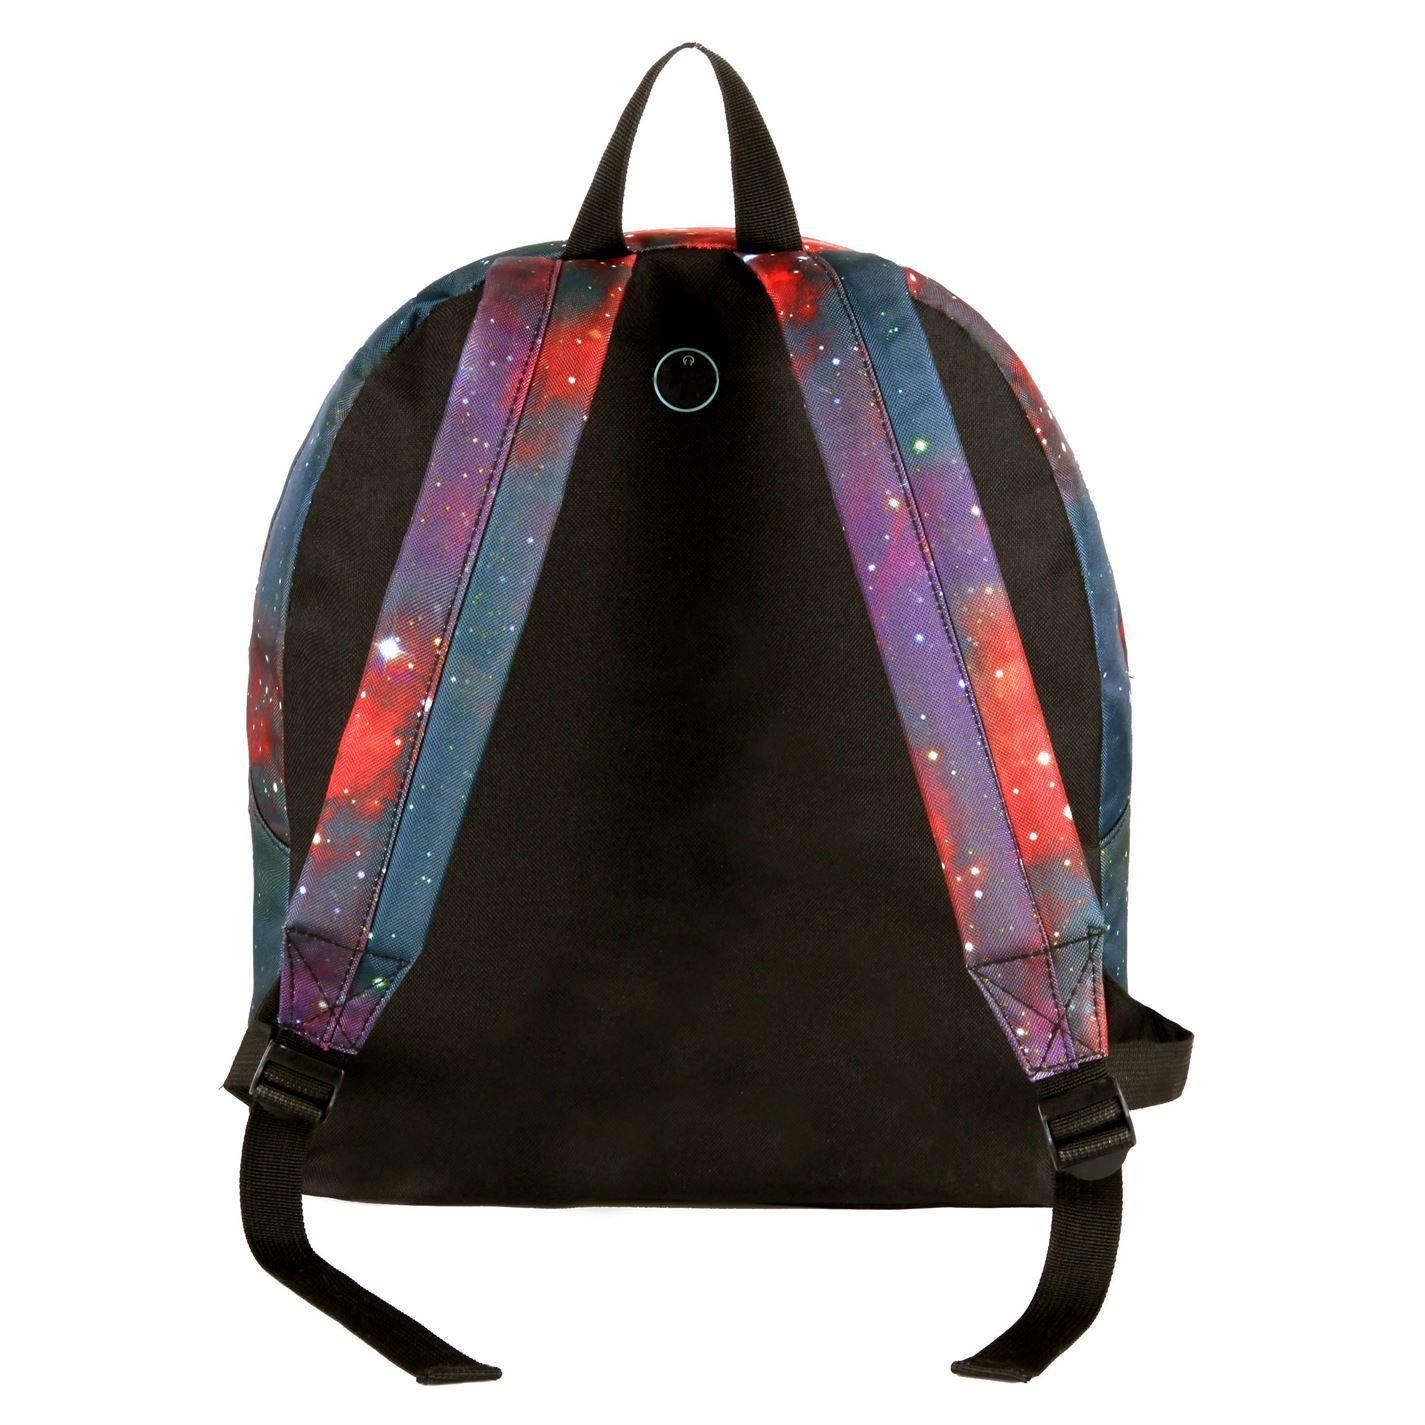 b881aaf128 Hot Tuna Galaxy Backpack Black Red Bag Holdall Carryall Rucksack Knapsack